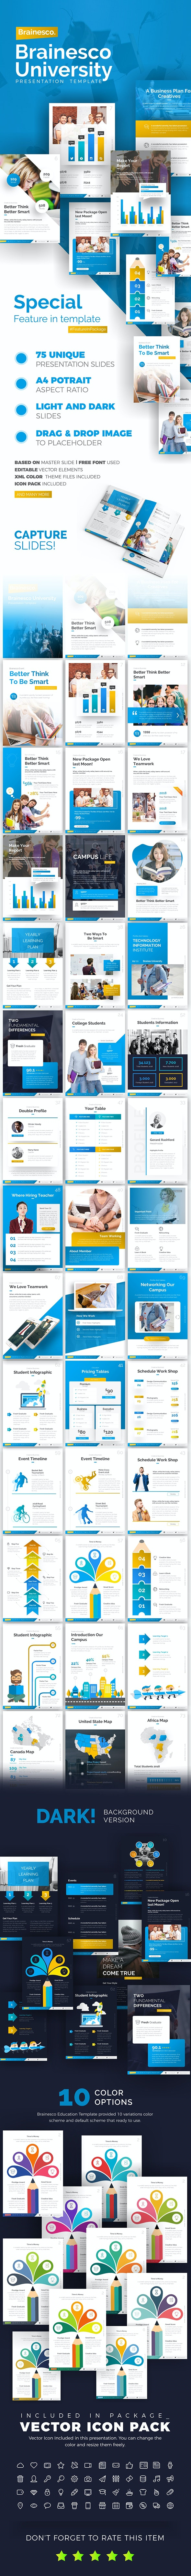 Brainesco Portrait Education PowerPoint Template - PowerPoint Templates Presentation Templates